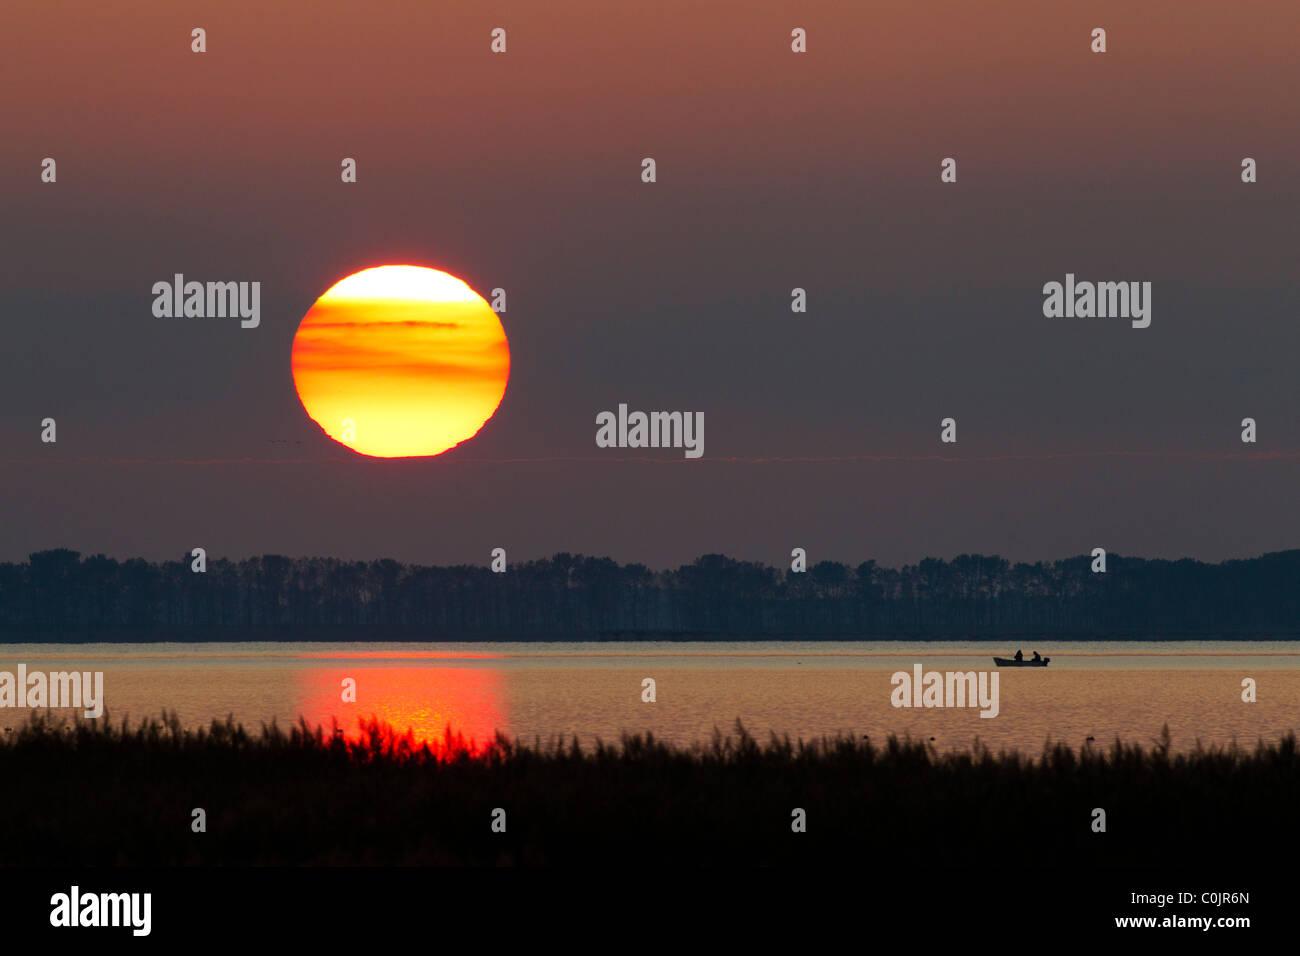 Fishermen in rowing-boat on lake at sunset, Western Pomerania, Germany - Stock Image